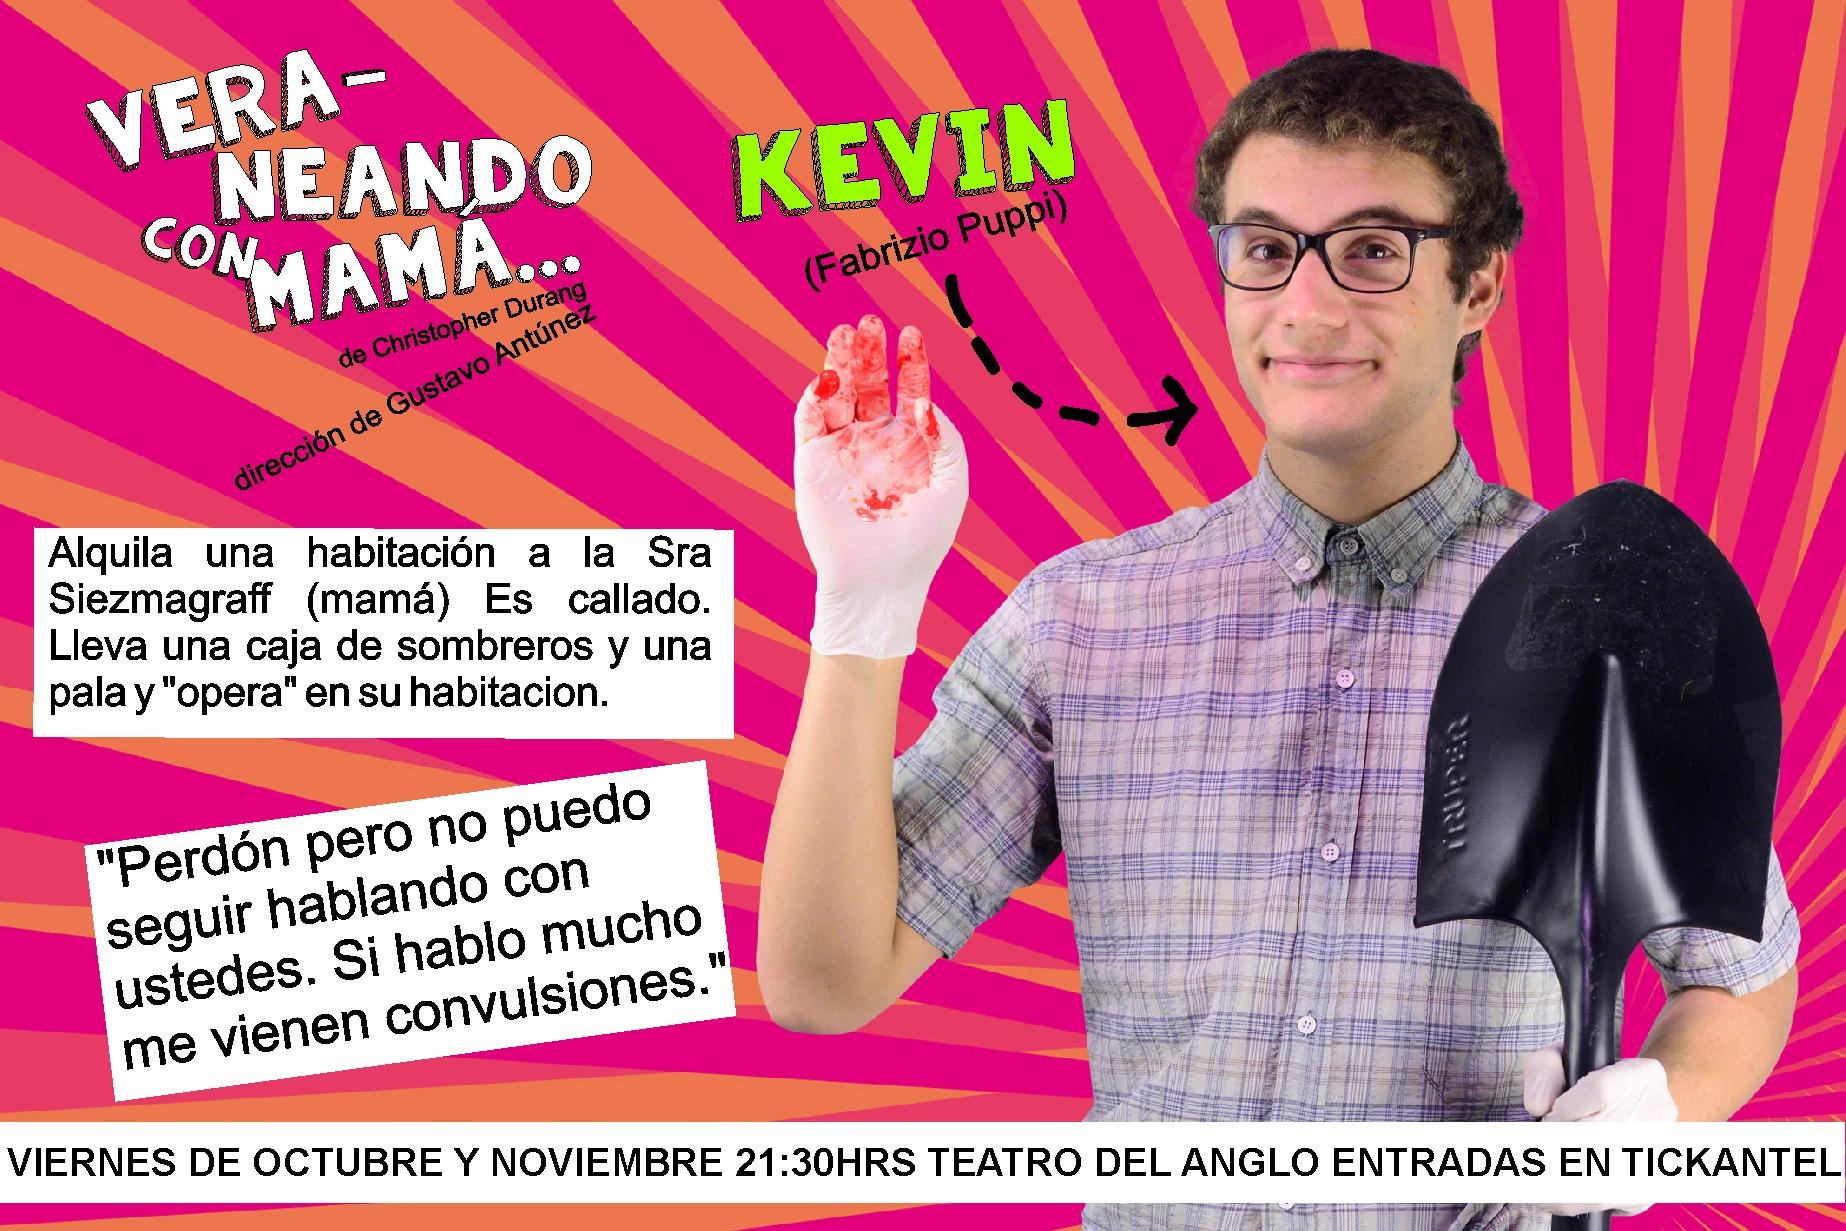 Kevin promo